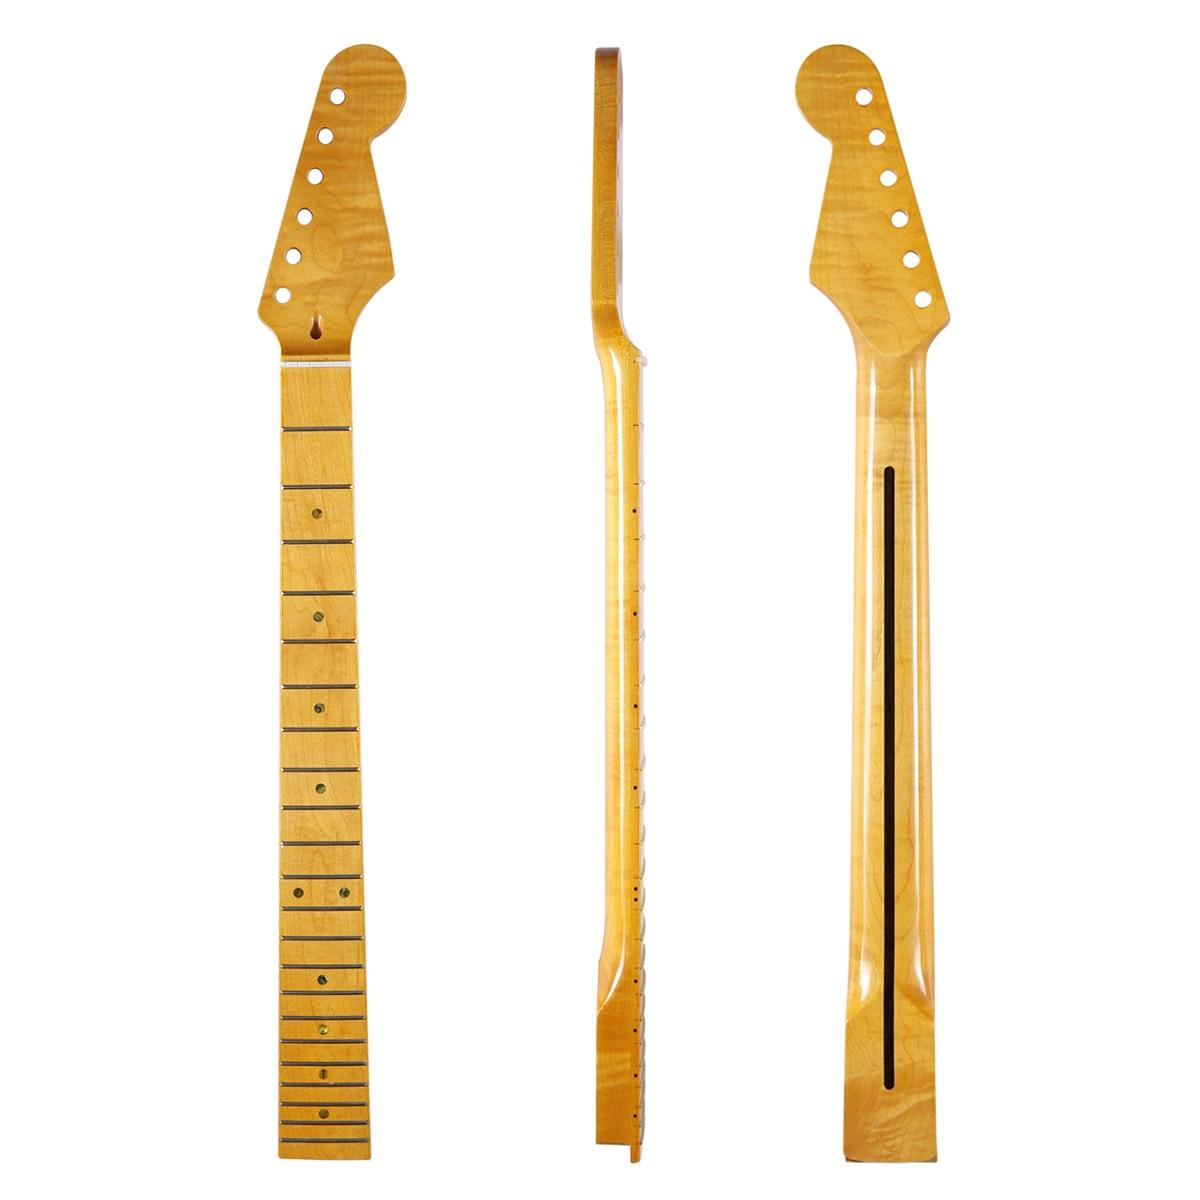 Kaish 22 лада Глянцевая канадский Тигр Пламя клен Strat гитаре шею с ушка инкрустация Кость Гайка для Stratocaster